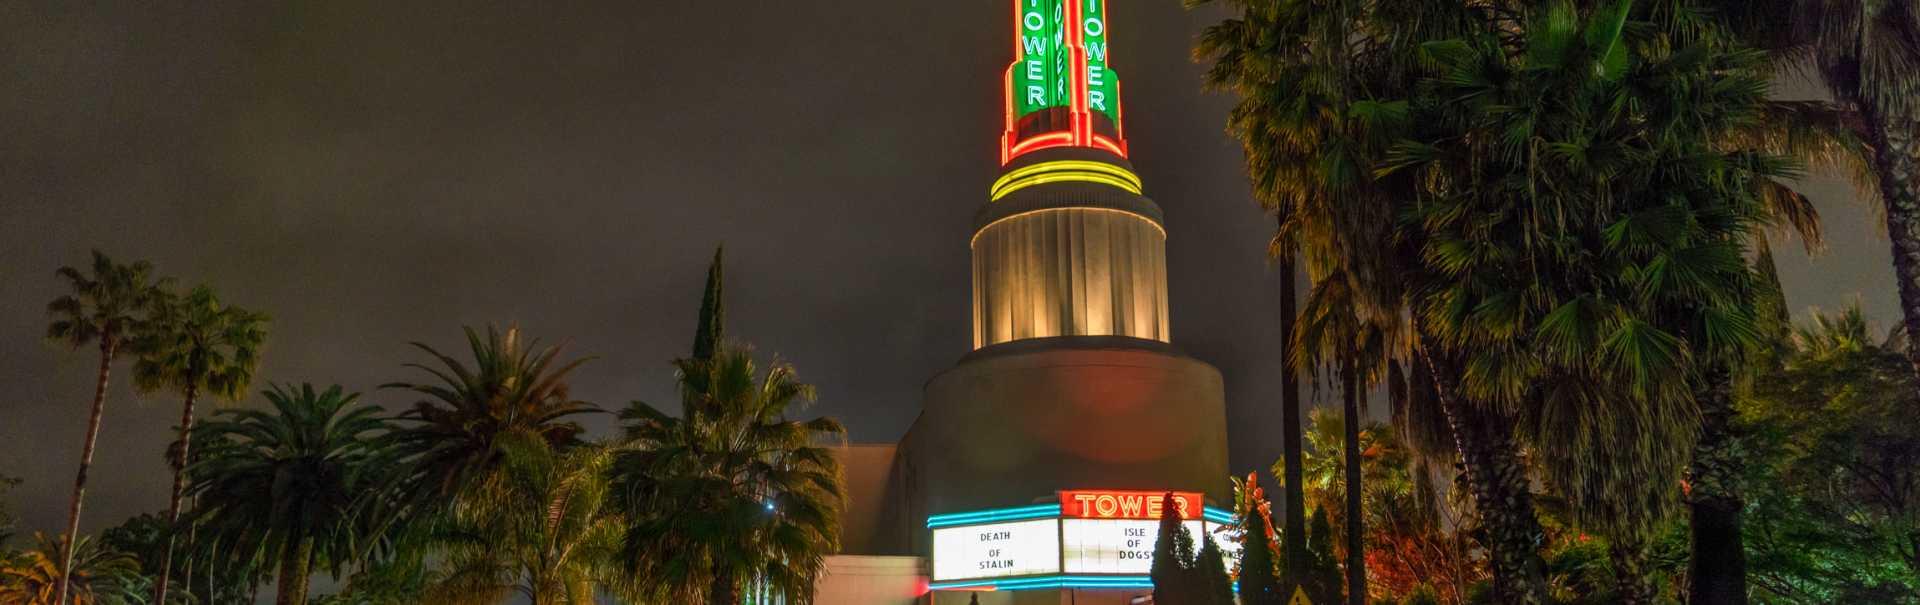 Sacramento Vacation Information | Hotels,